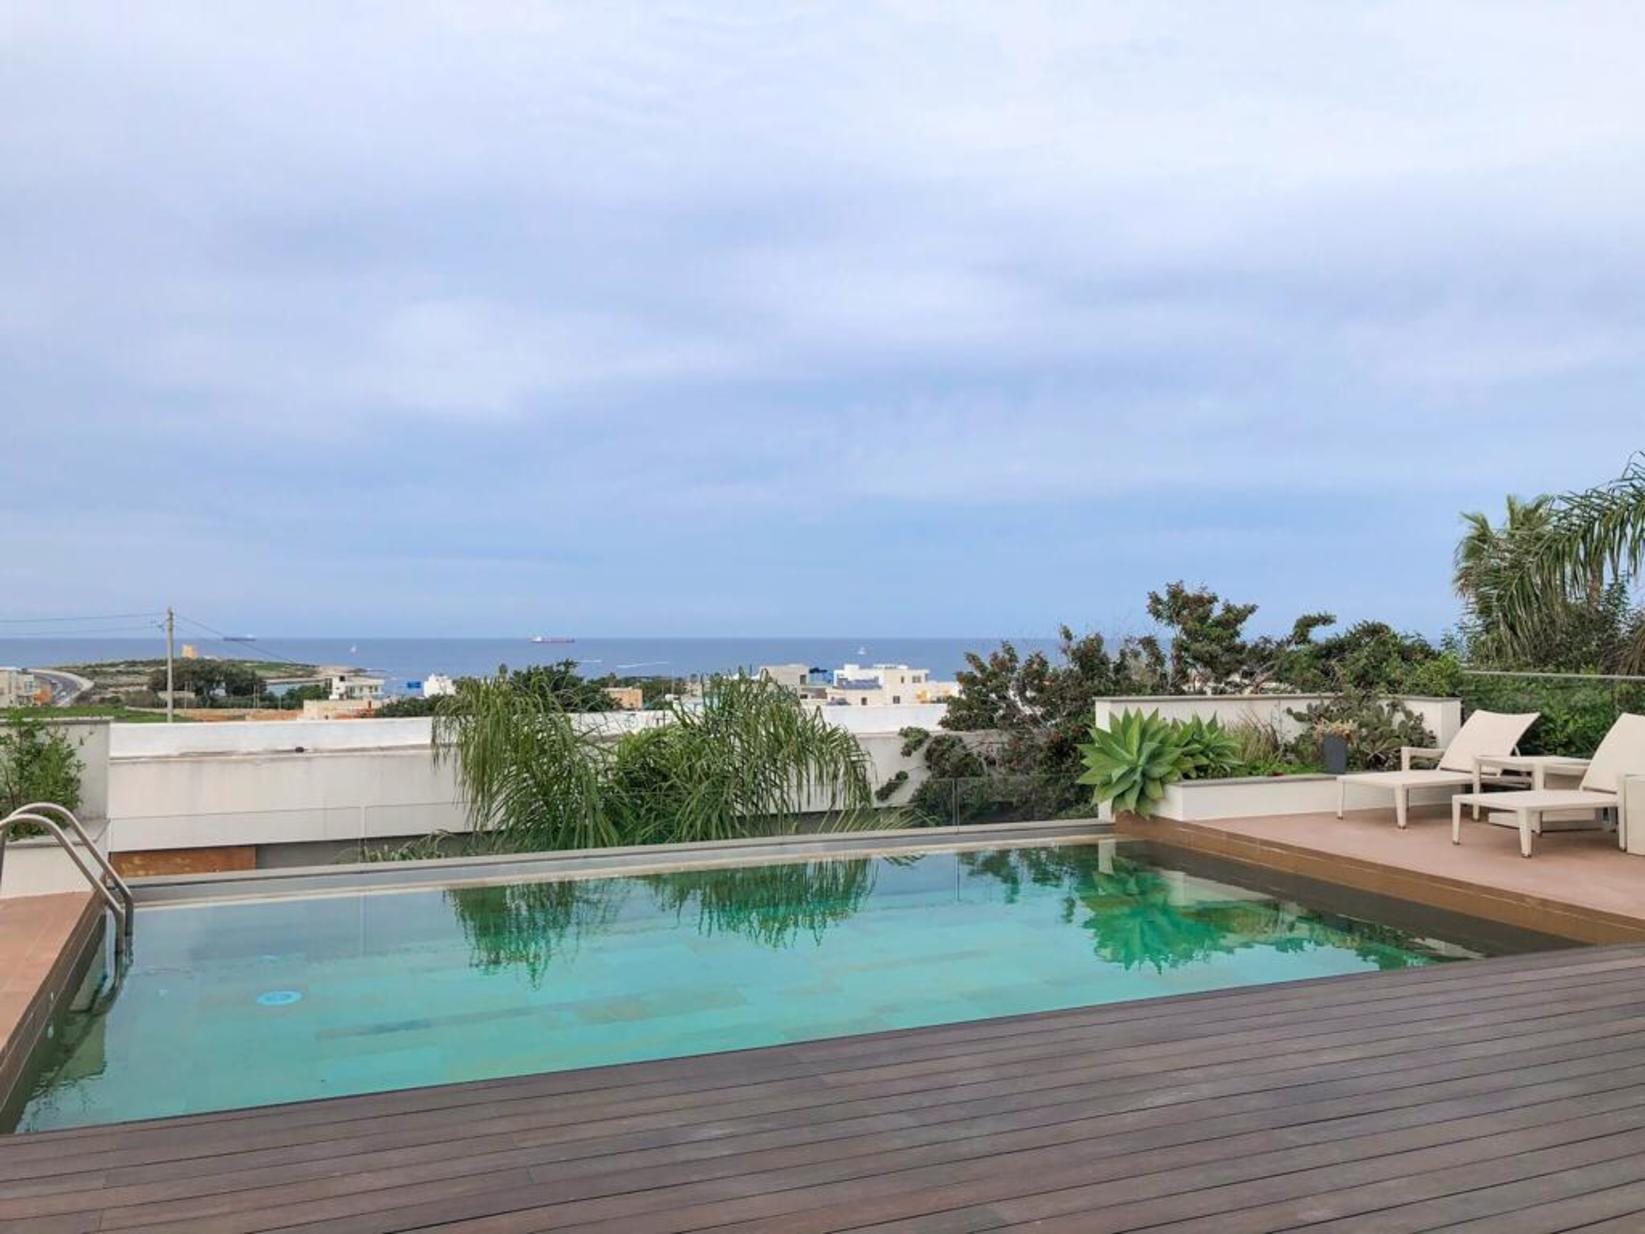 3 bed Villa For Rent in Bahar ic-Caghaq, Bahar ic-Caghaq - thumb 4